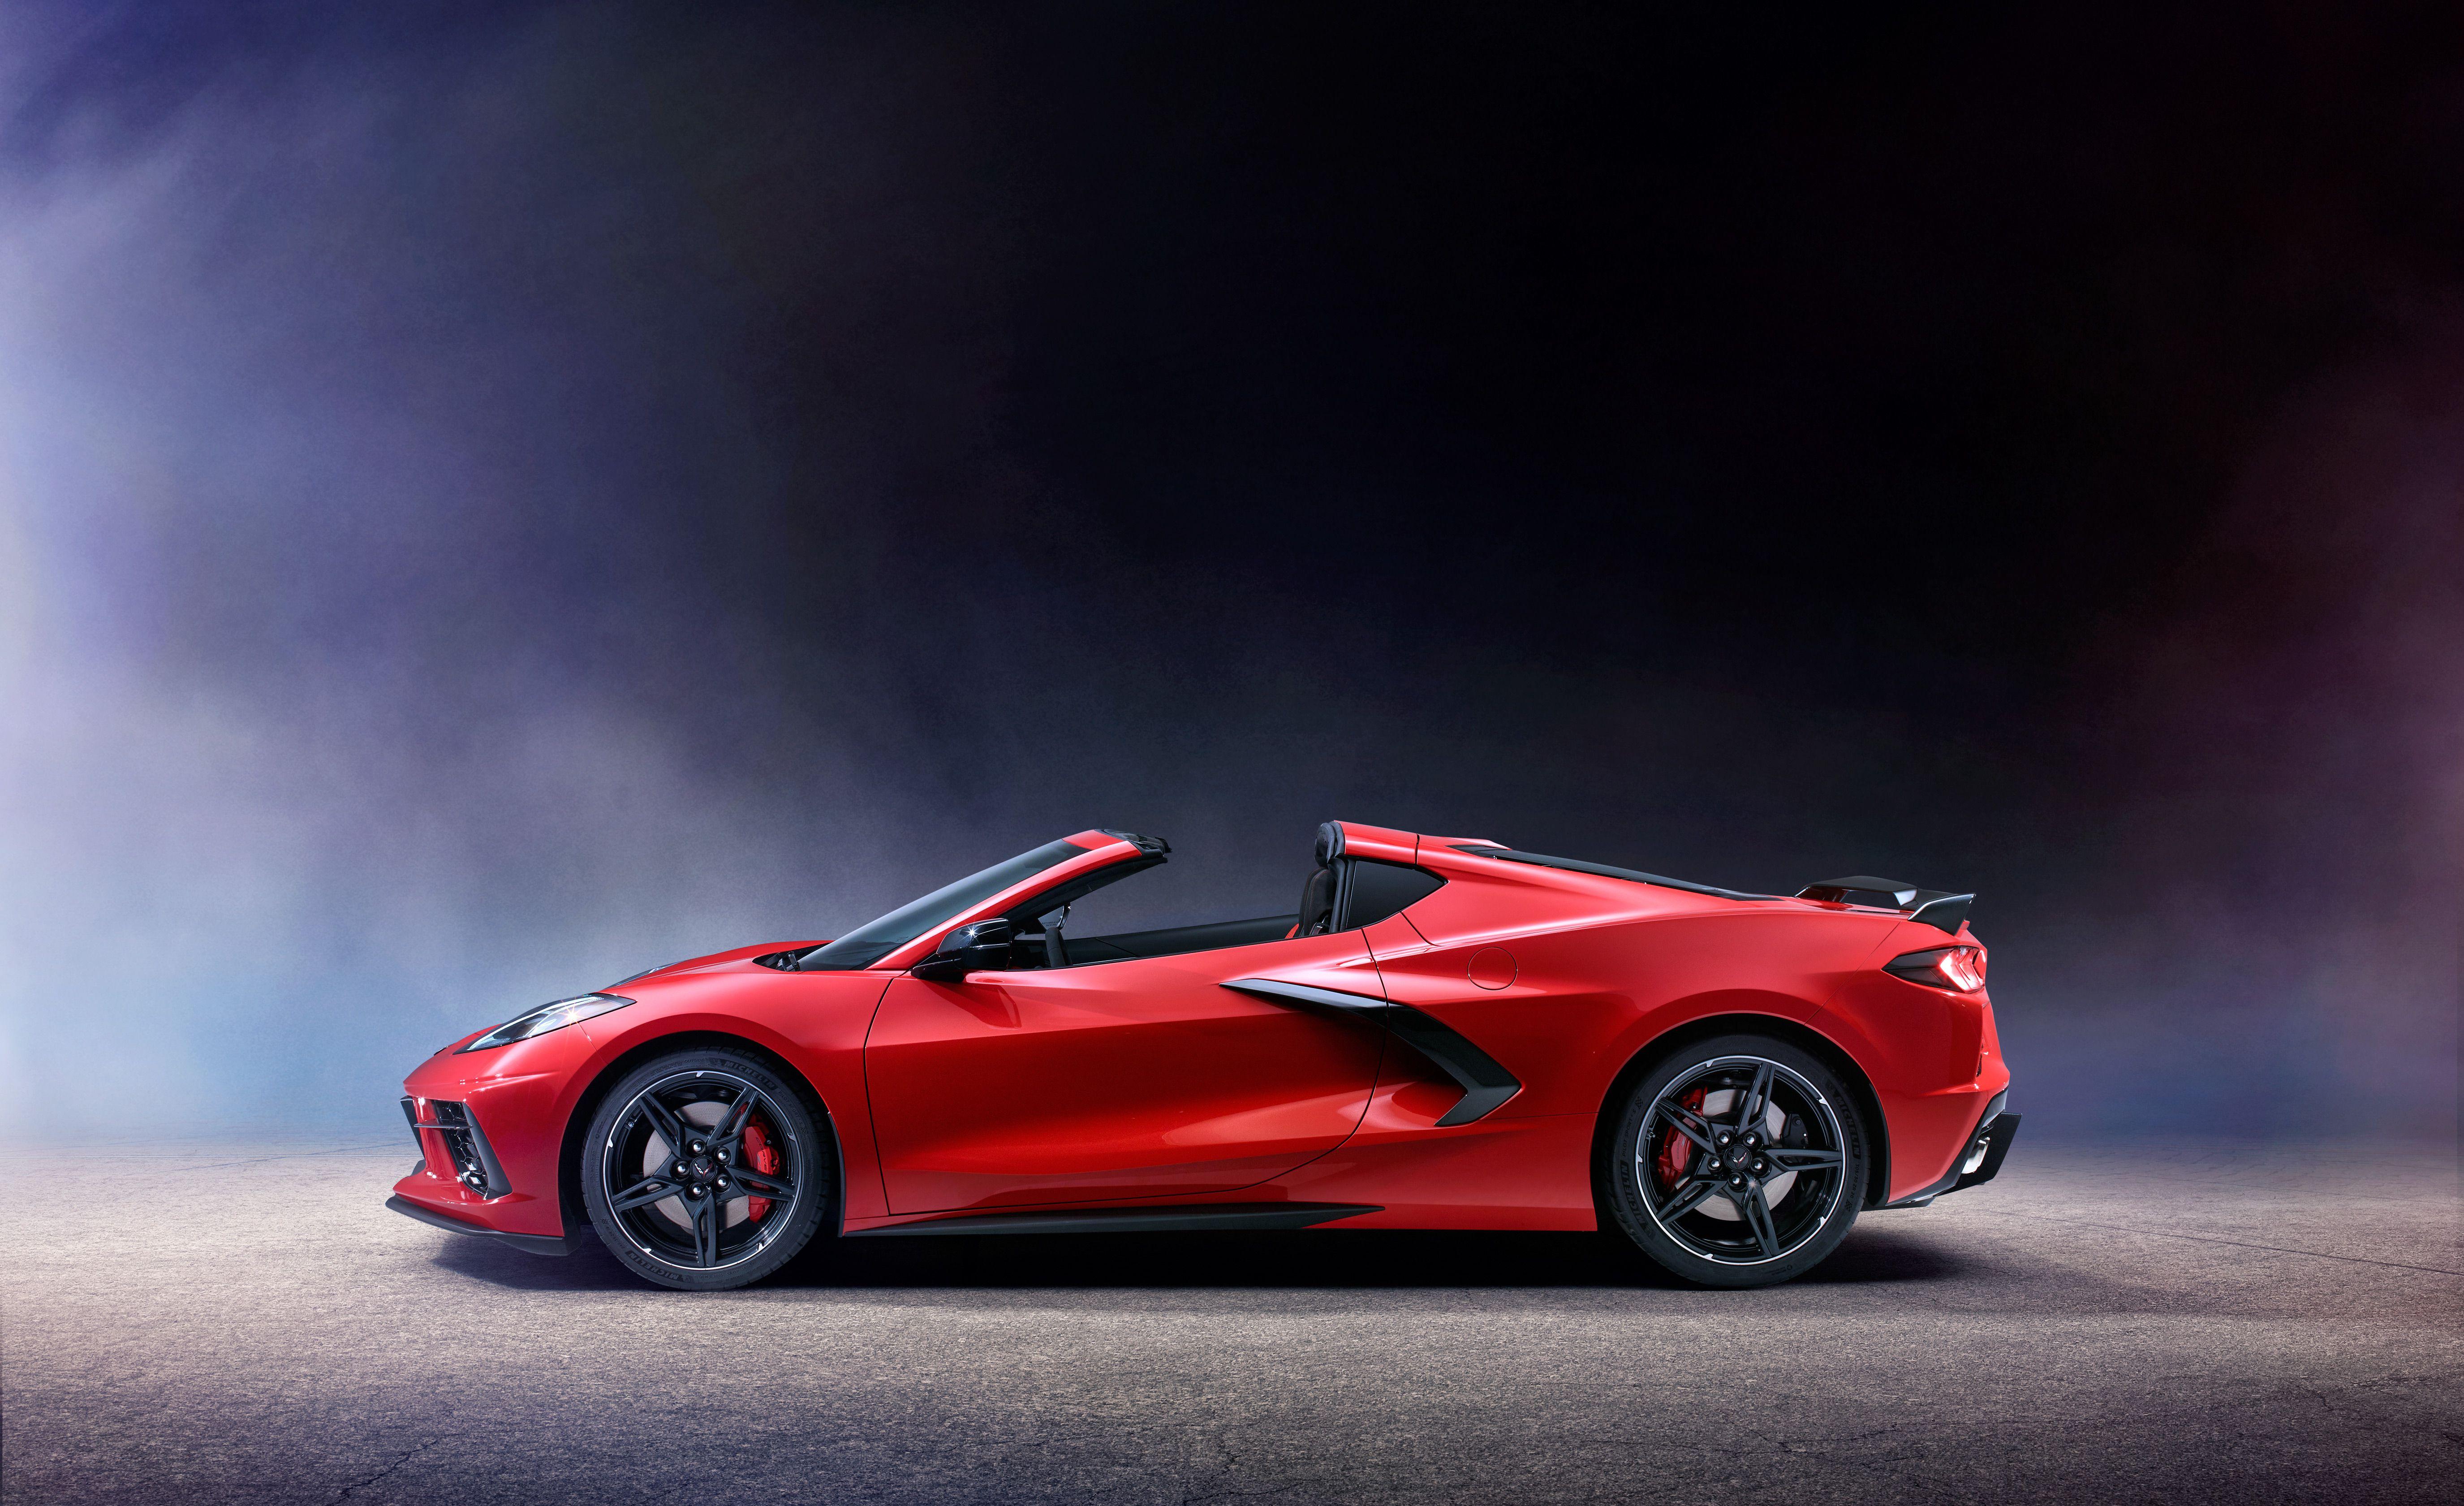 2020 Chevrolet Corvette Stingray C8 New, HD Cars, 4k ...